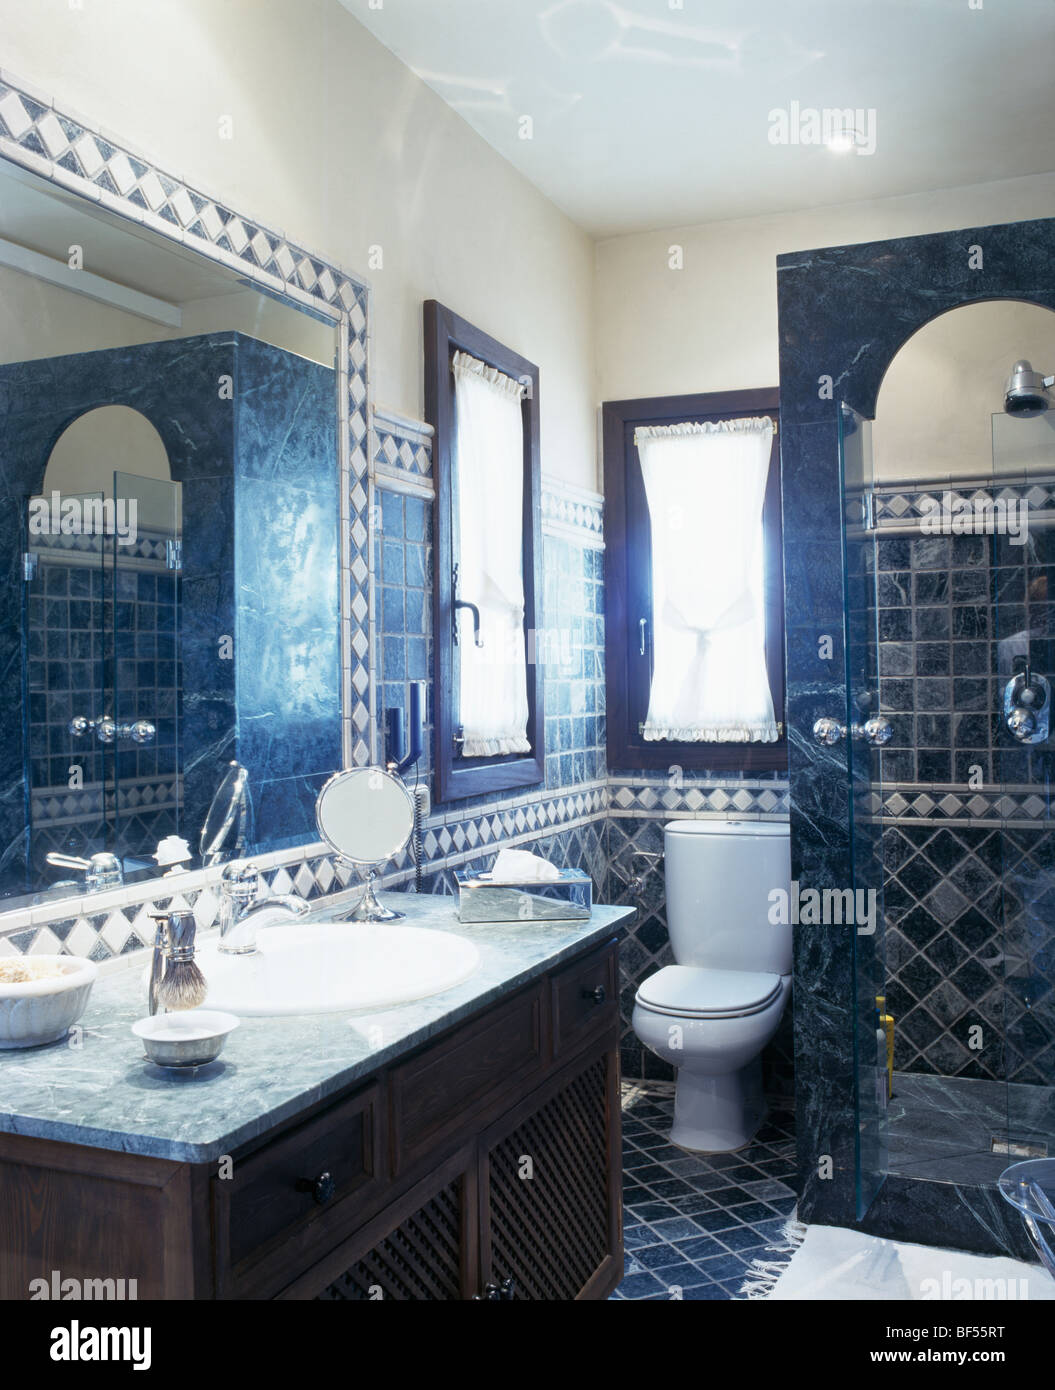 Traditional blue tiled Spanish bathroom Stock Photo: 26544556 - Alamy